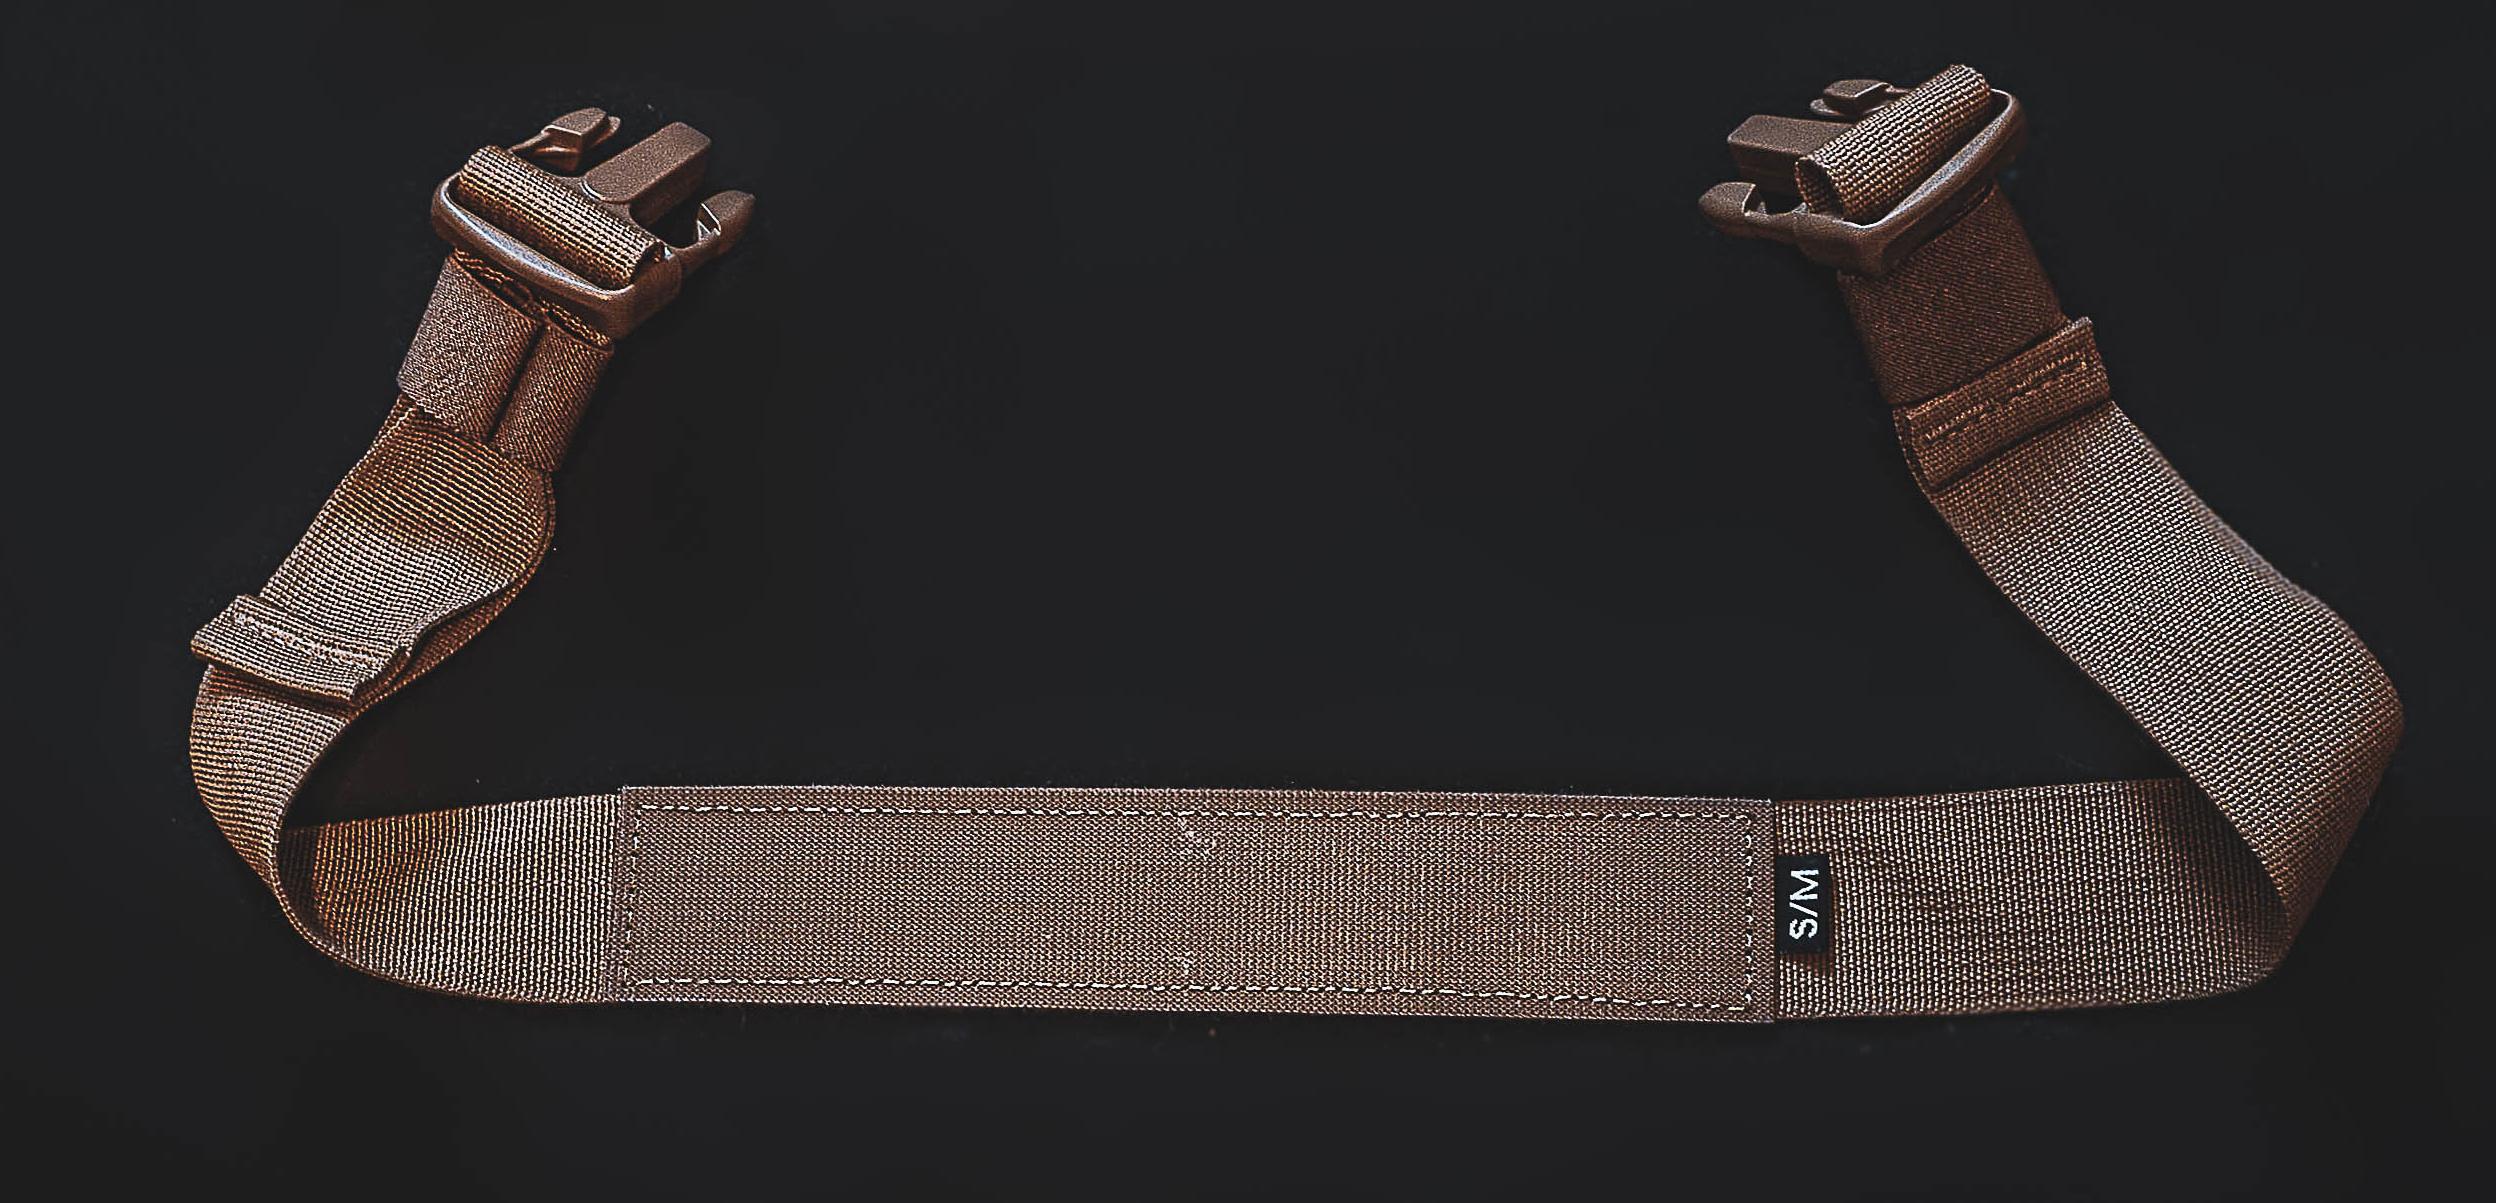 velocity systems cw belt apc upgrade